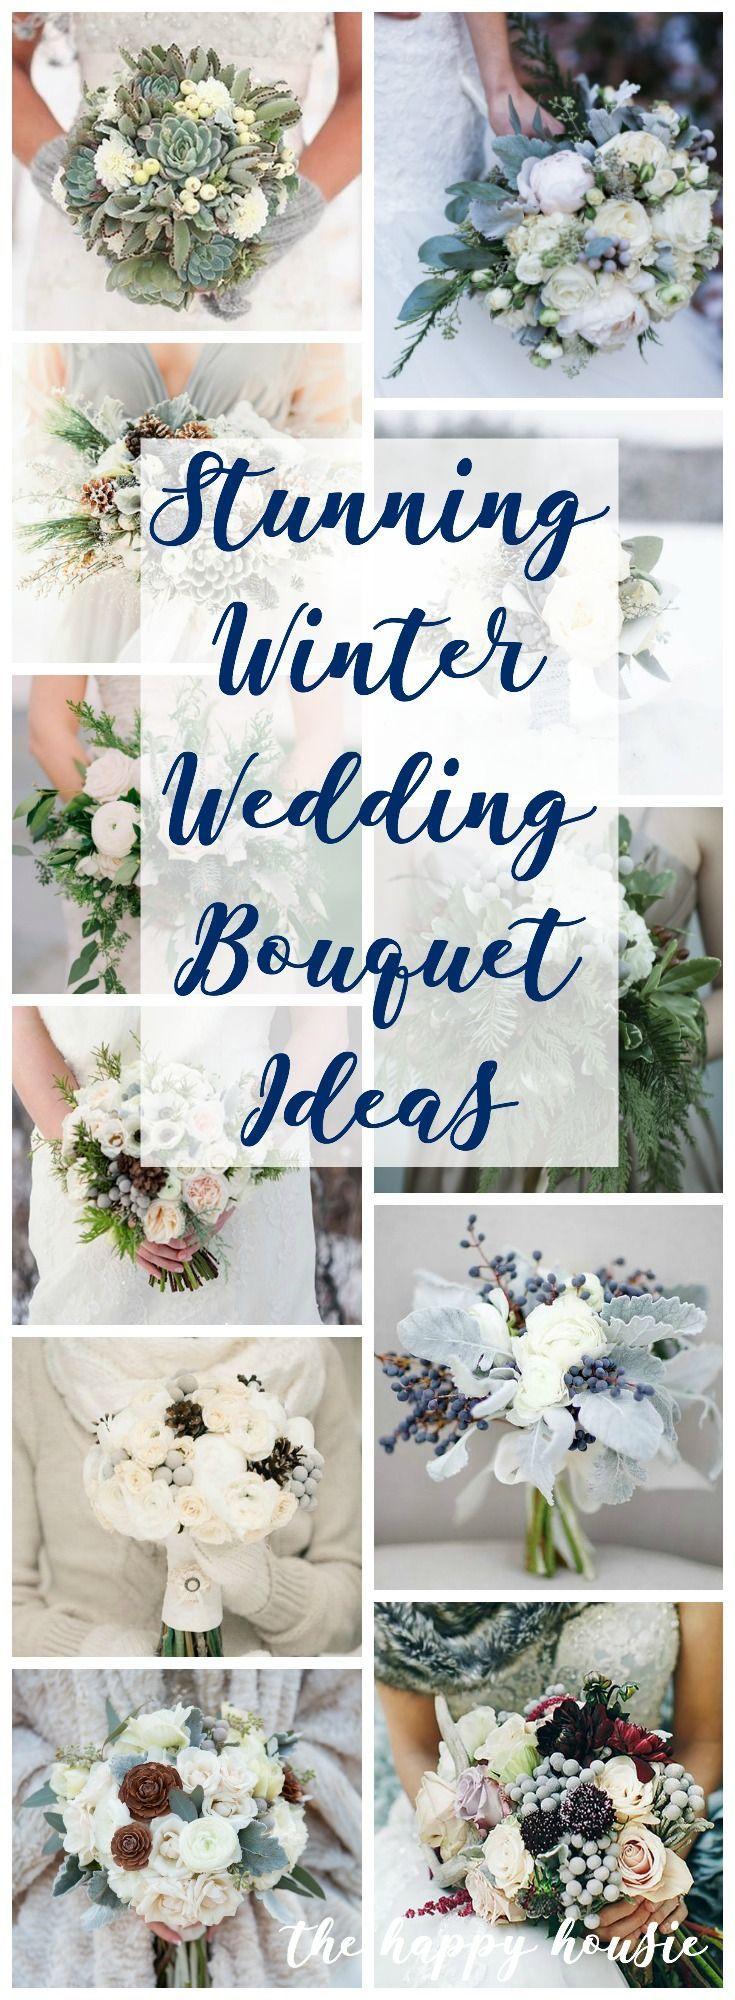 Stunning Winter Wedding Bouquet Ideas | The Happy Housie #winterbouquet #winterwedding #bridalbouquets